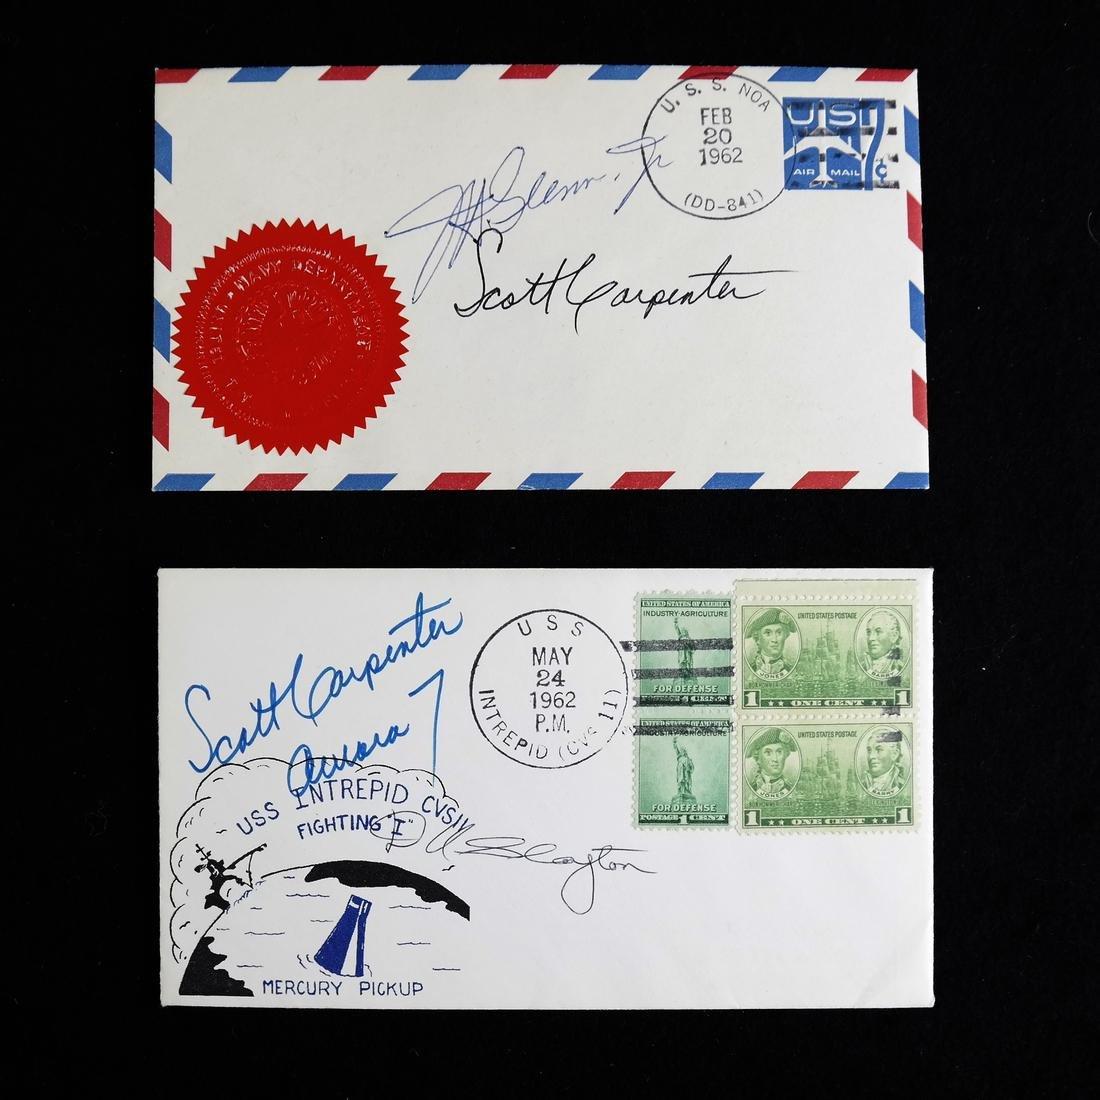 1962 FRIENDSHIP 7 & AURORA 7 CREW SIGNED POSTAL COVERS